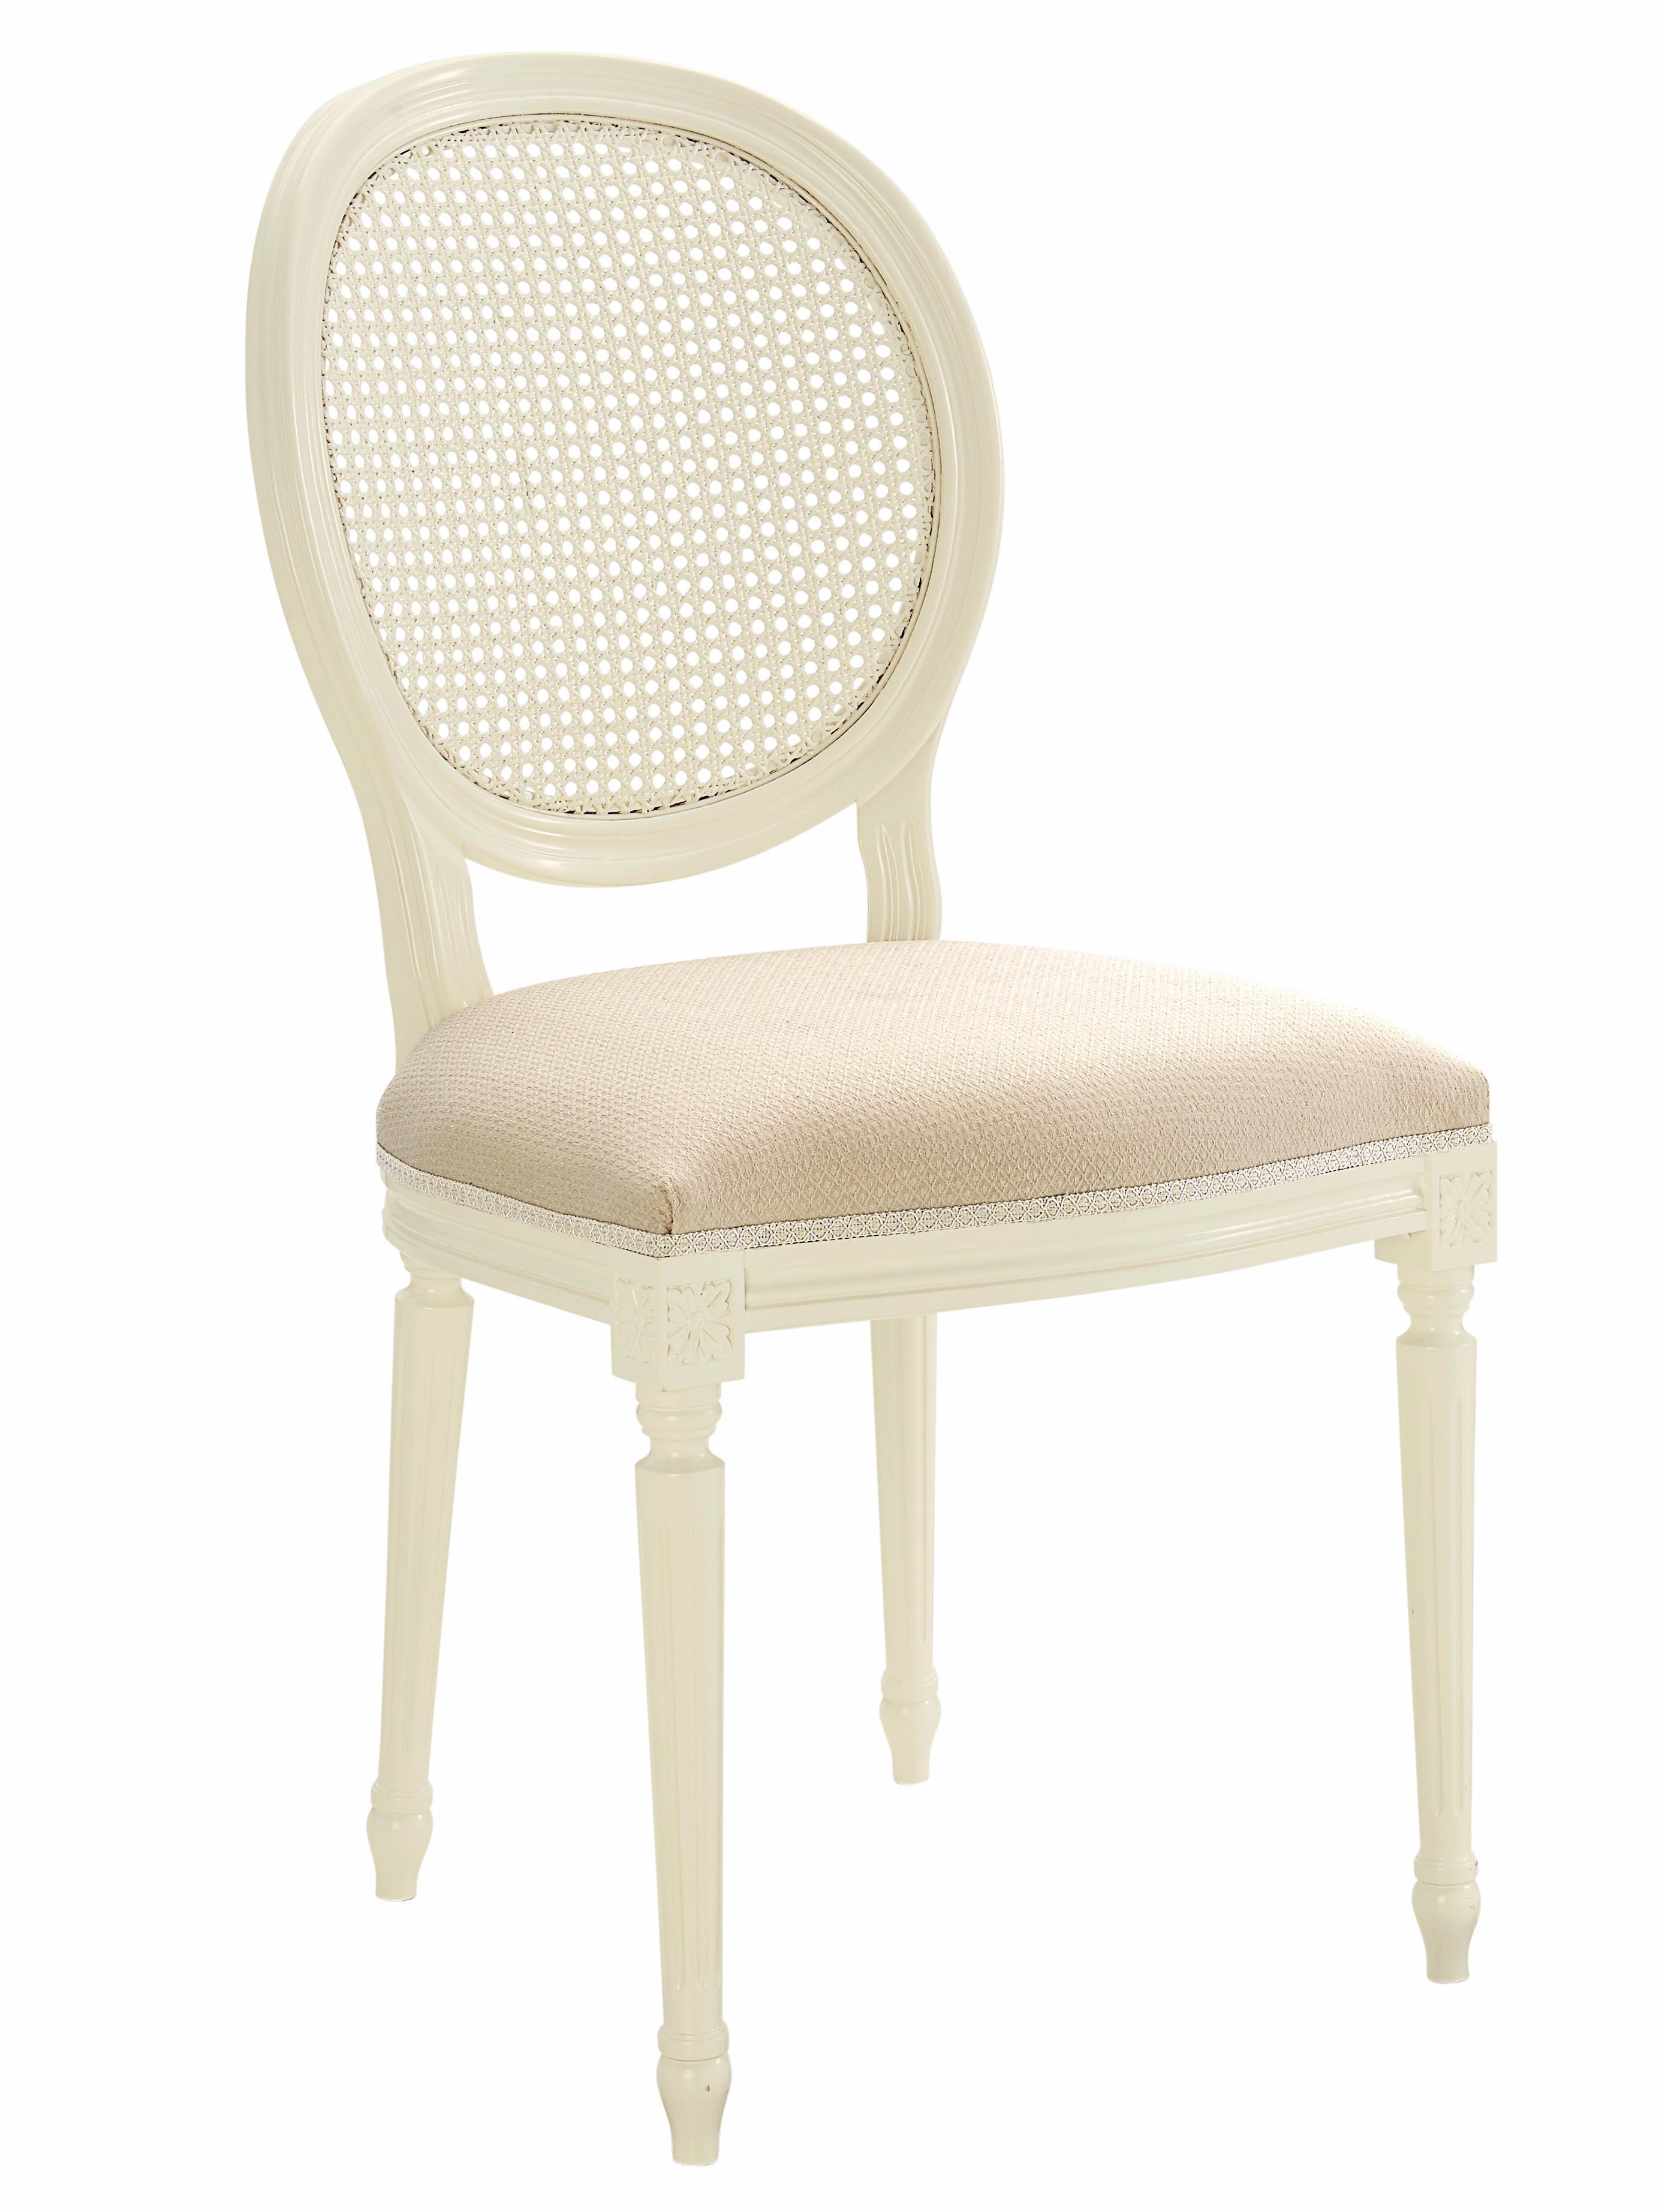 Met bekleding van stoel in set van of stoel in set van of for Eettafel stoel leer